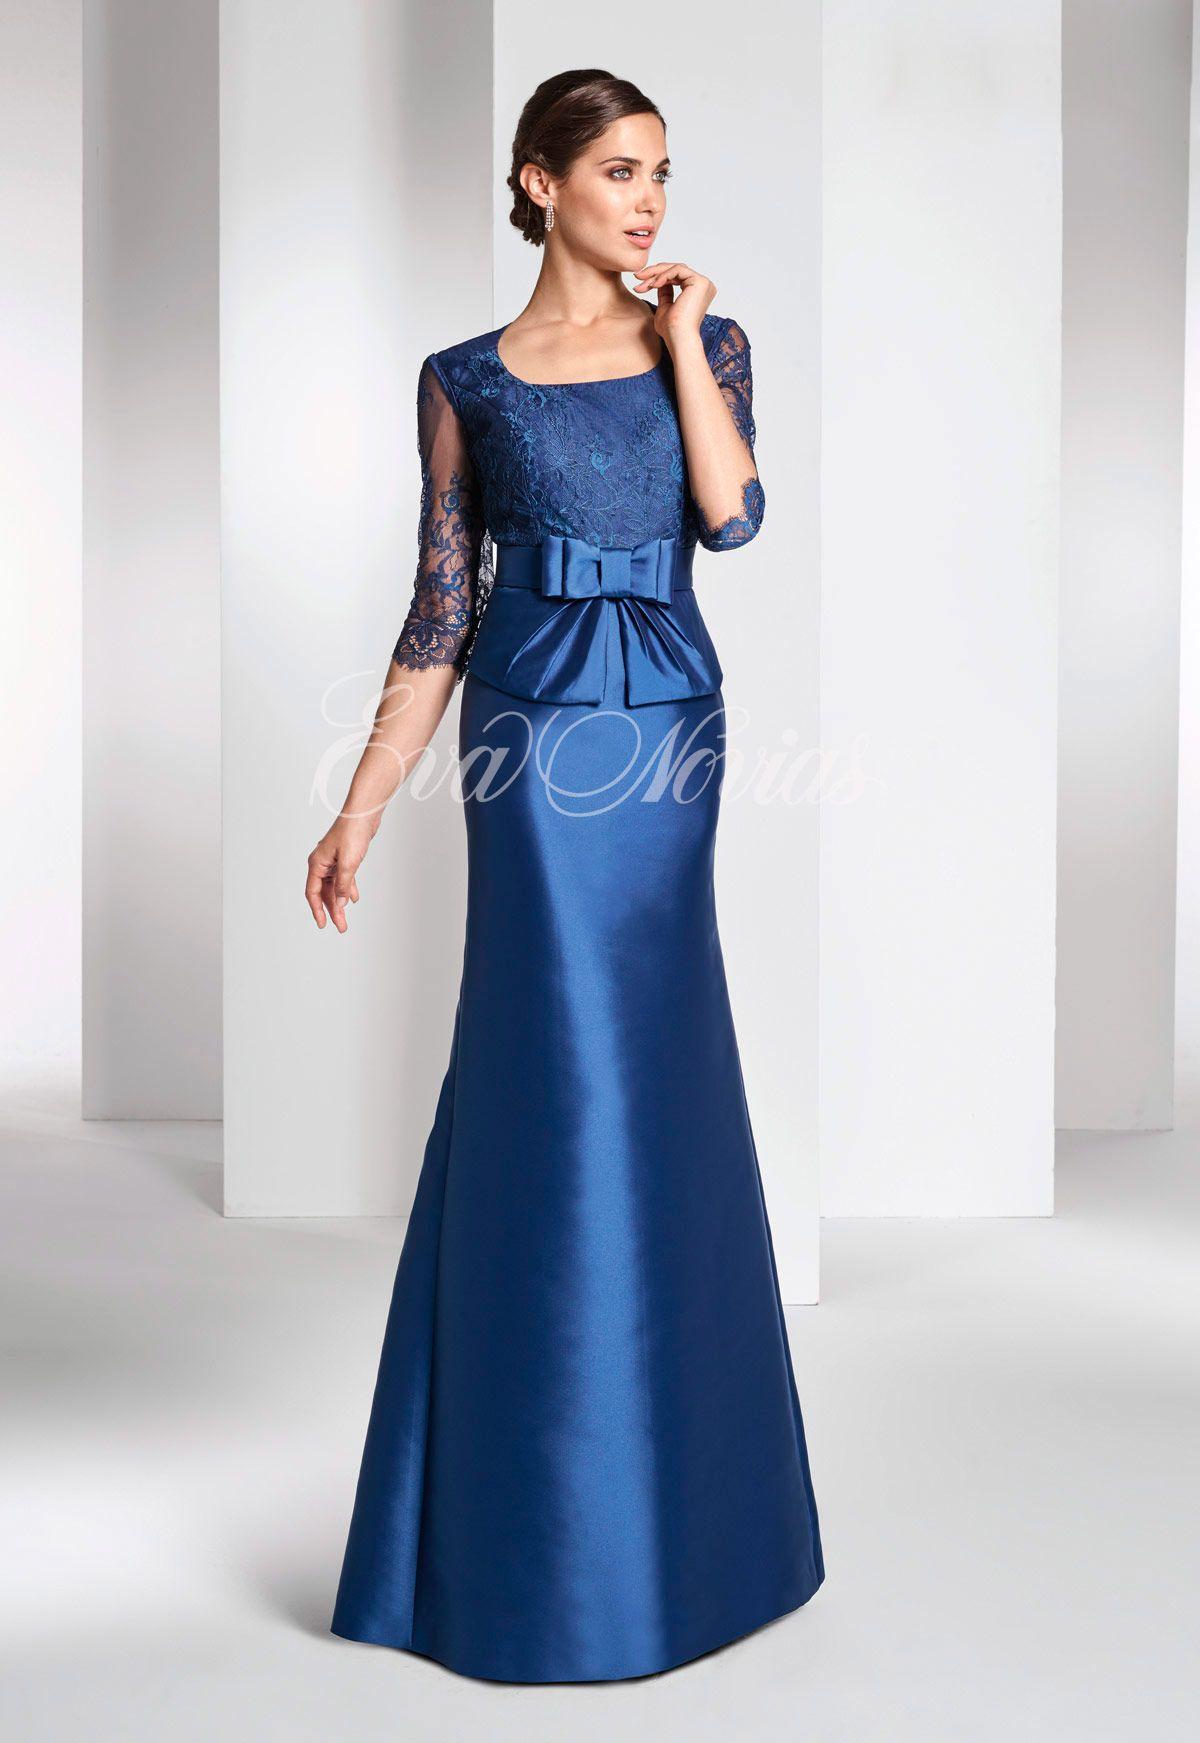 Tiendas madrid vestidos madrina boda